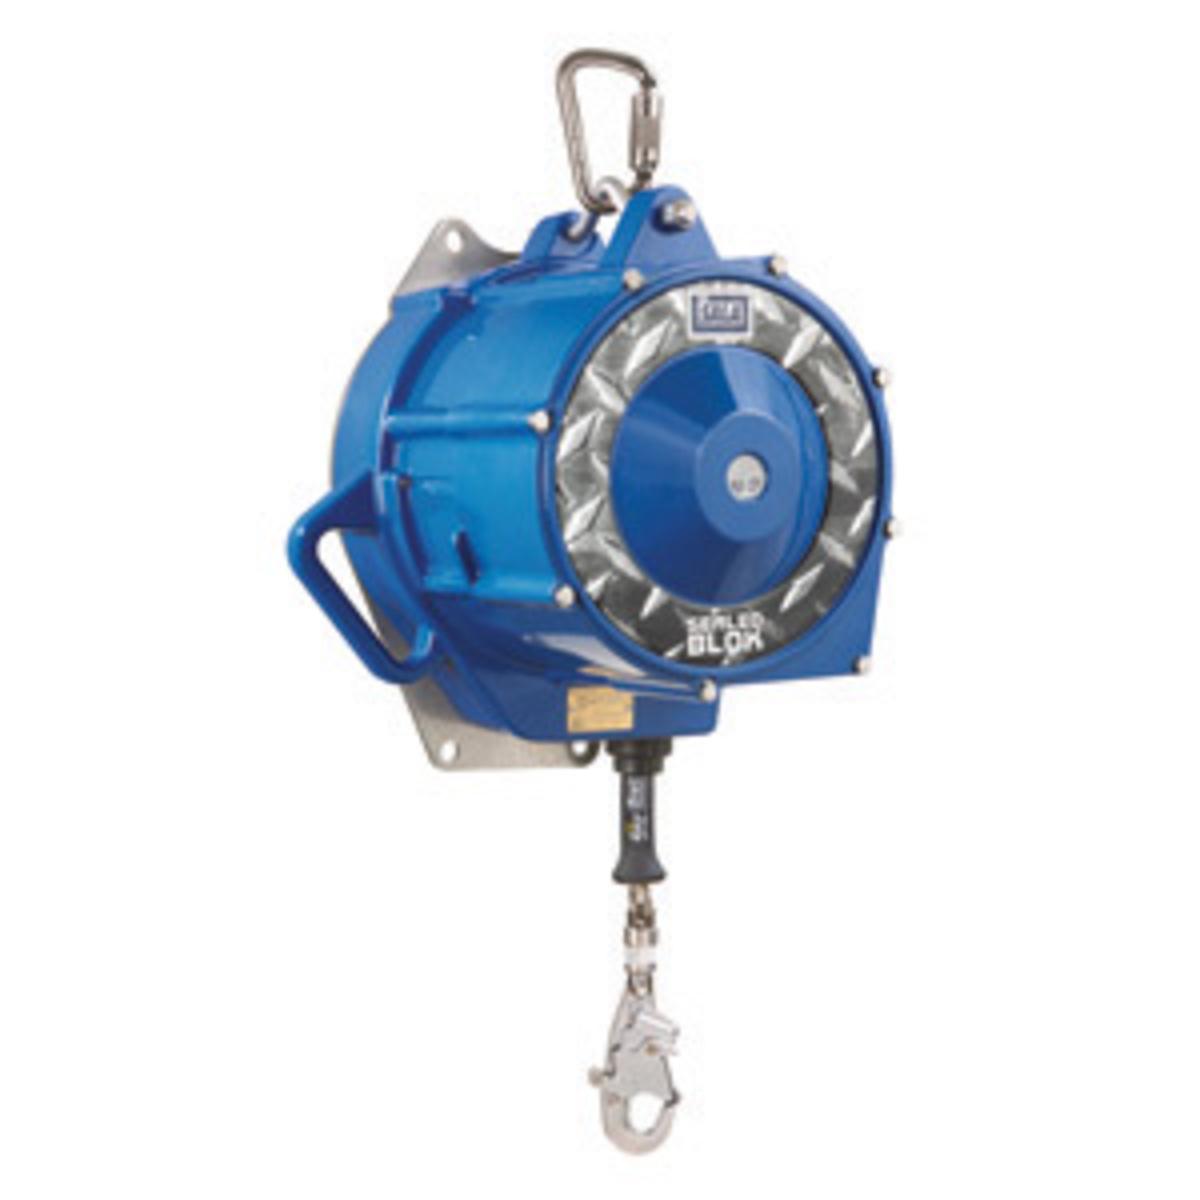 Airgas - D623400652 - 3M™ DBI-SALA® 175\' Sealed-Blok™ Self ...